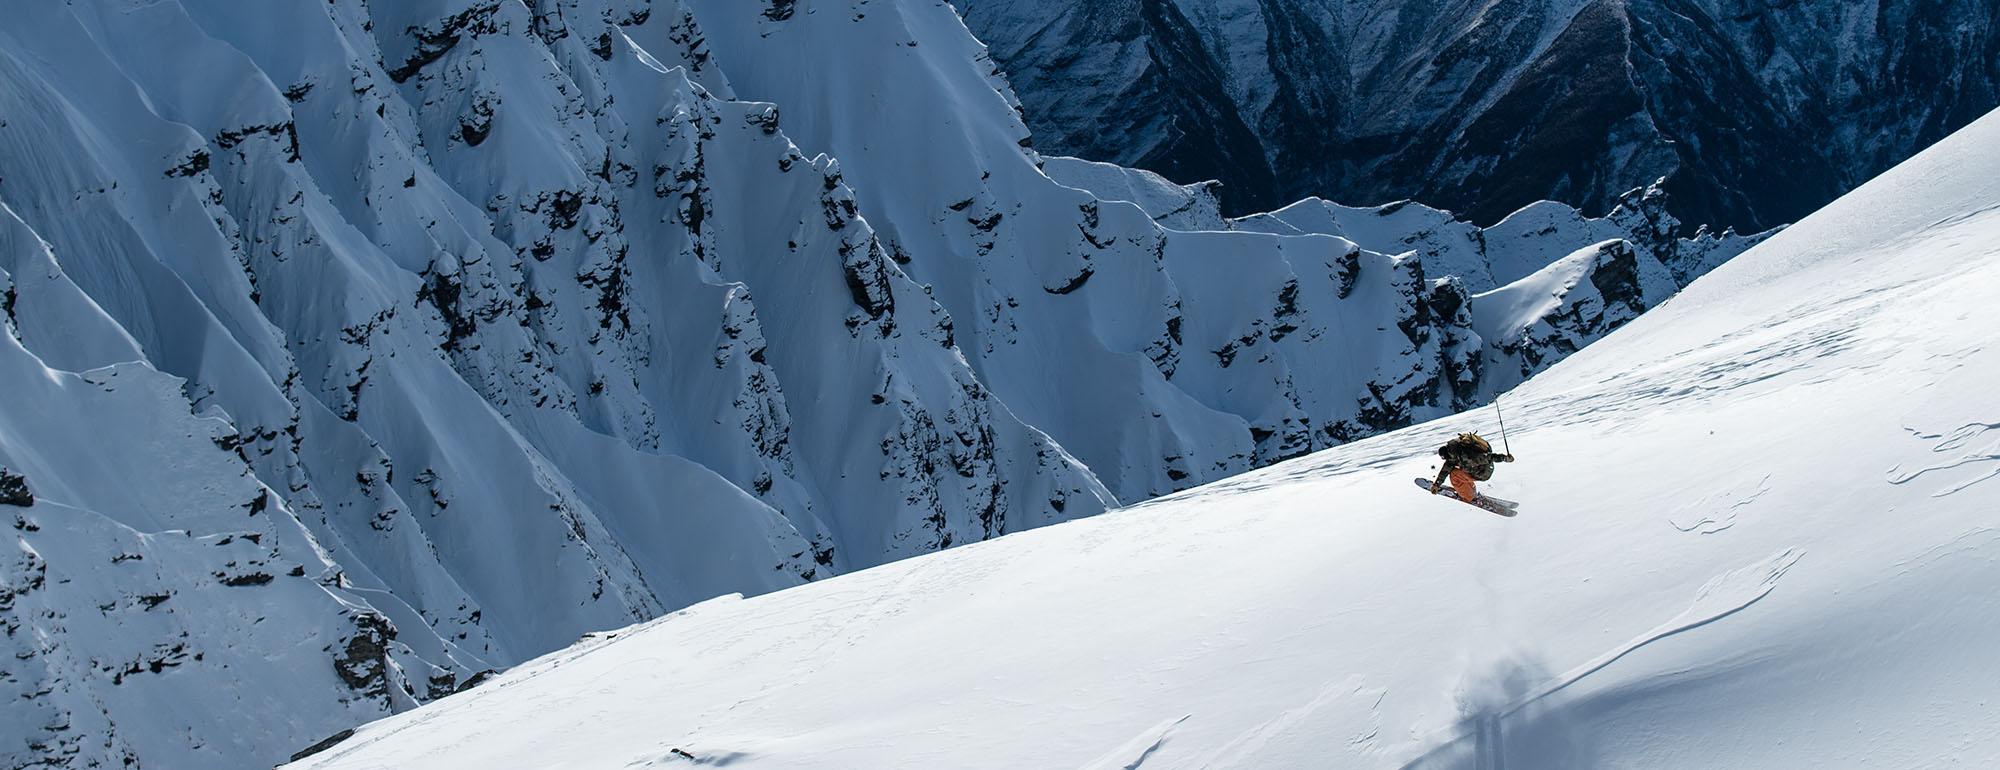 Skigebiet Wagrain - Skiverleih - Sport Center Rudi Huber